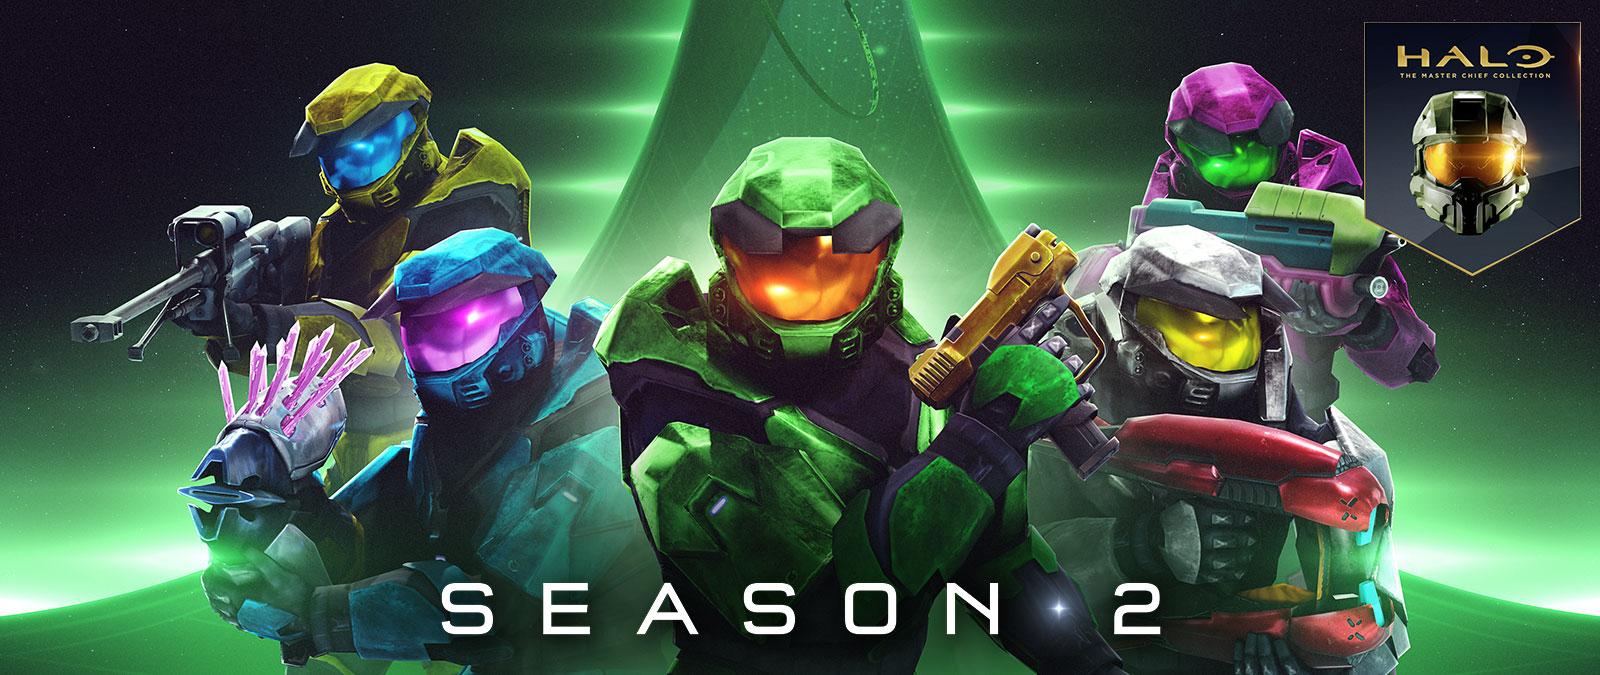 Halo: The Master Chief Collection, Season 2, 5 Spartan από το Halo Combat Evolved κρατούν πολύχρωμα όπλα όπως το needler και το πιστόλι